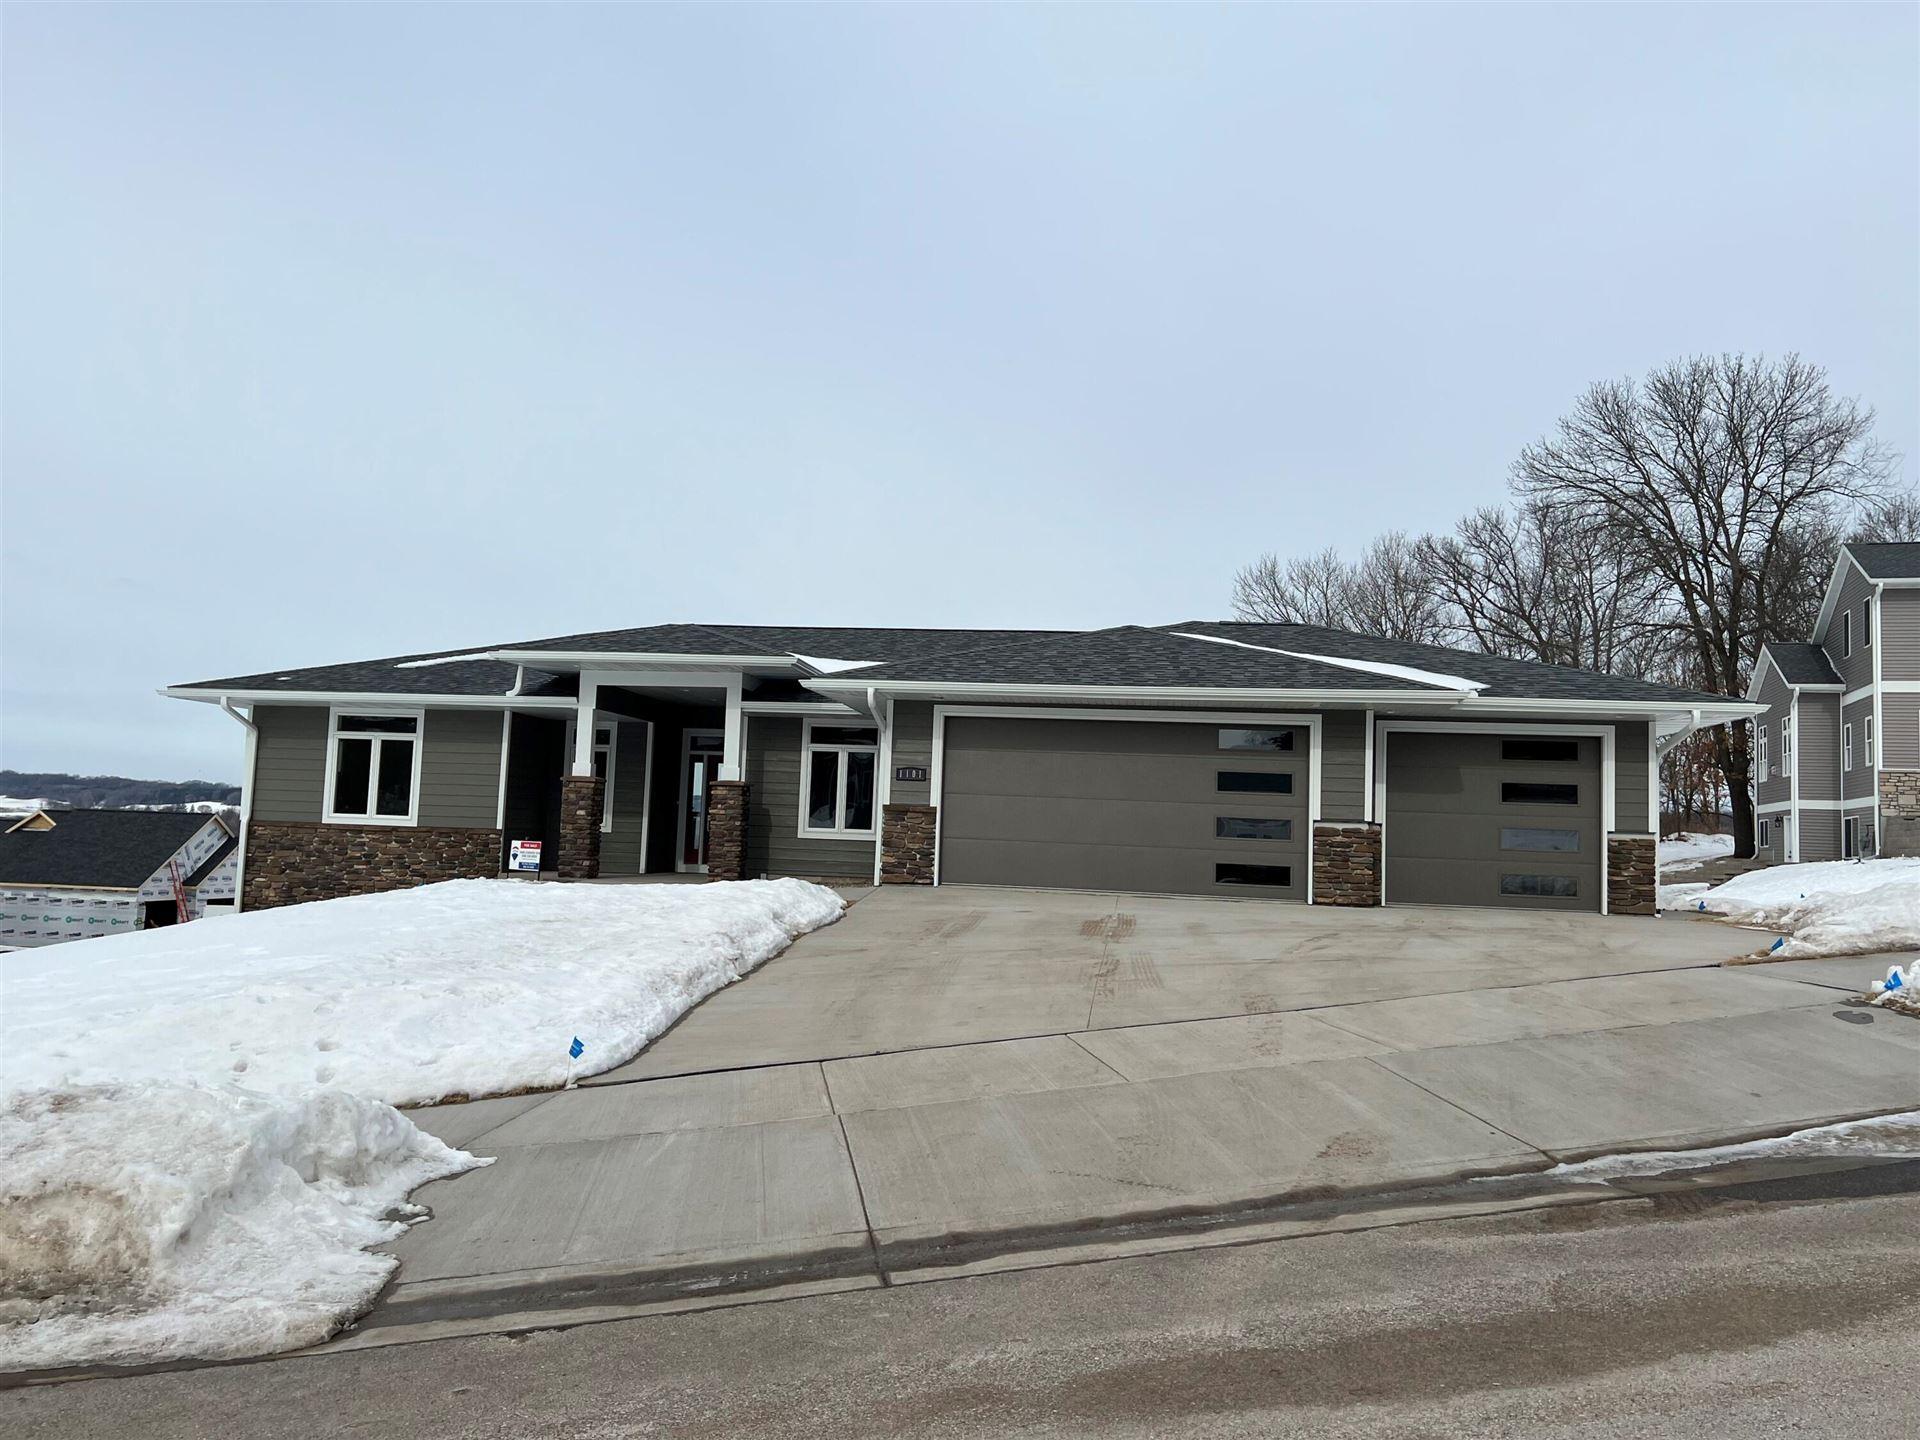 1101 Maple Shade Ct, Holmen, WI 54636 - MLS#: 1749268